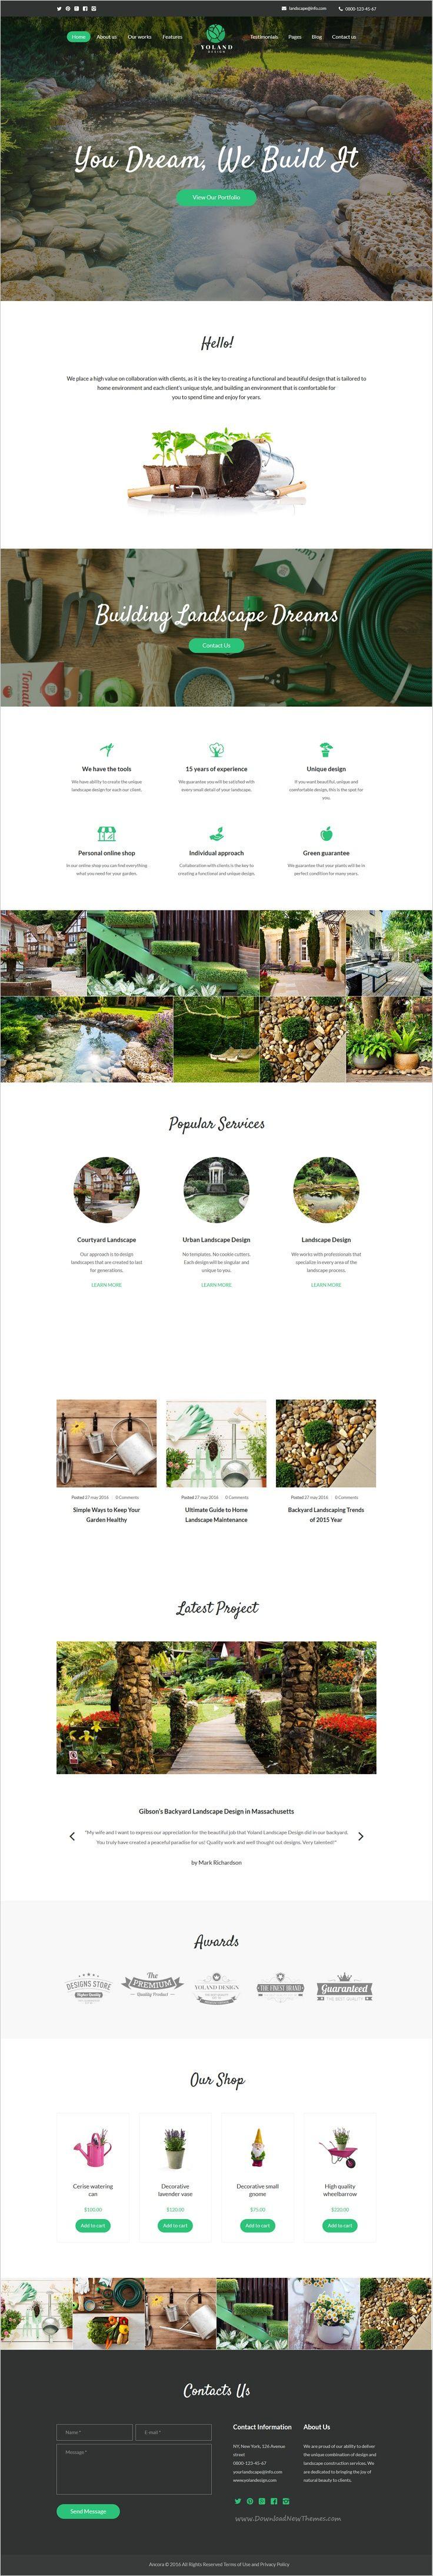 Yoland is a beautifully design premium #WordPress #theme for #Courtyard, Urban Landscape Design and Garden accessories store website download now➯ https://themeforest.net/item/yoland-landscape-design-garden-accesories-store-/16705104?ref=Datasata